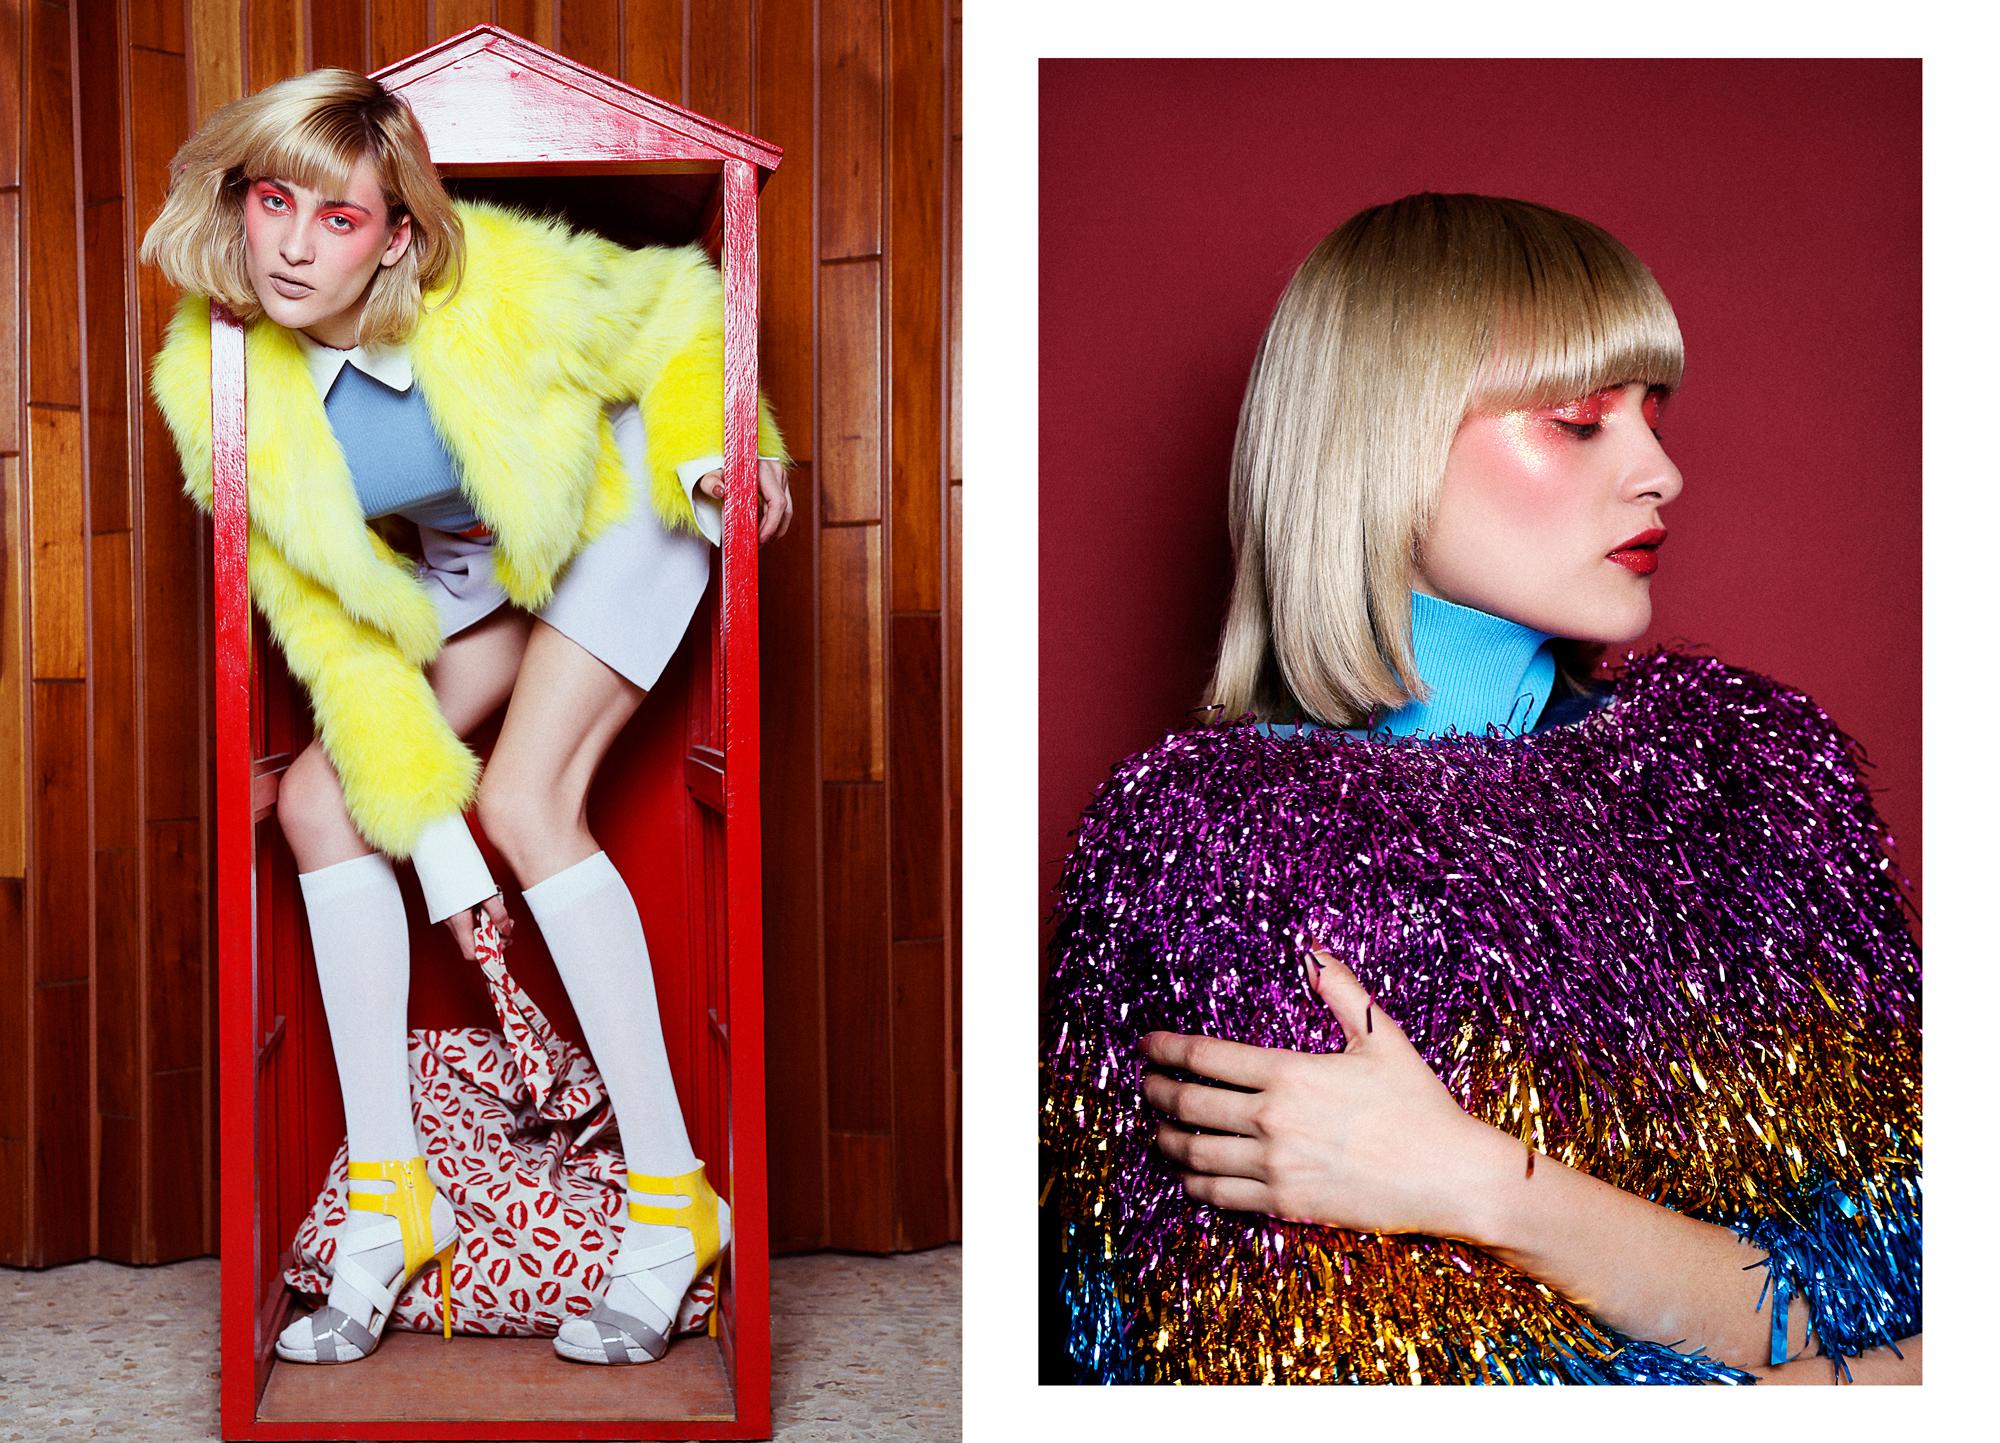 Fur Coat : Iceberg /  Blouse & Skirt : Gregorio Cayetano /  Belt : Gucci /  Handbag : Mancandy /  Shoes : Brantano  R ight //  Dress : Bimba y Lola /  Coat : Tenor de Mesones